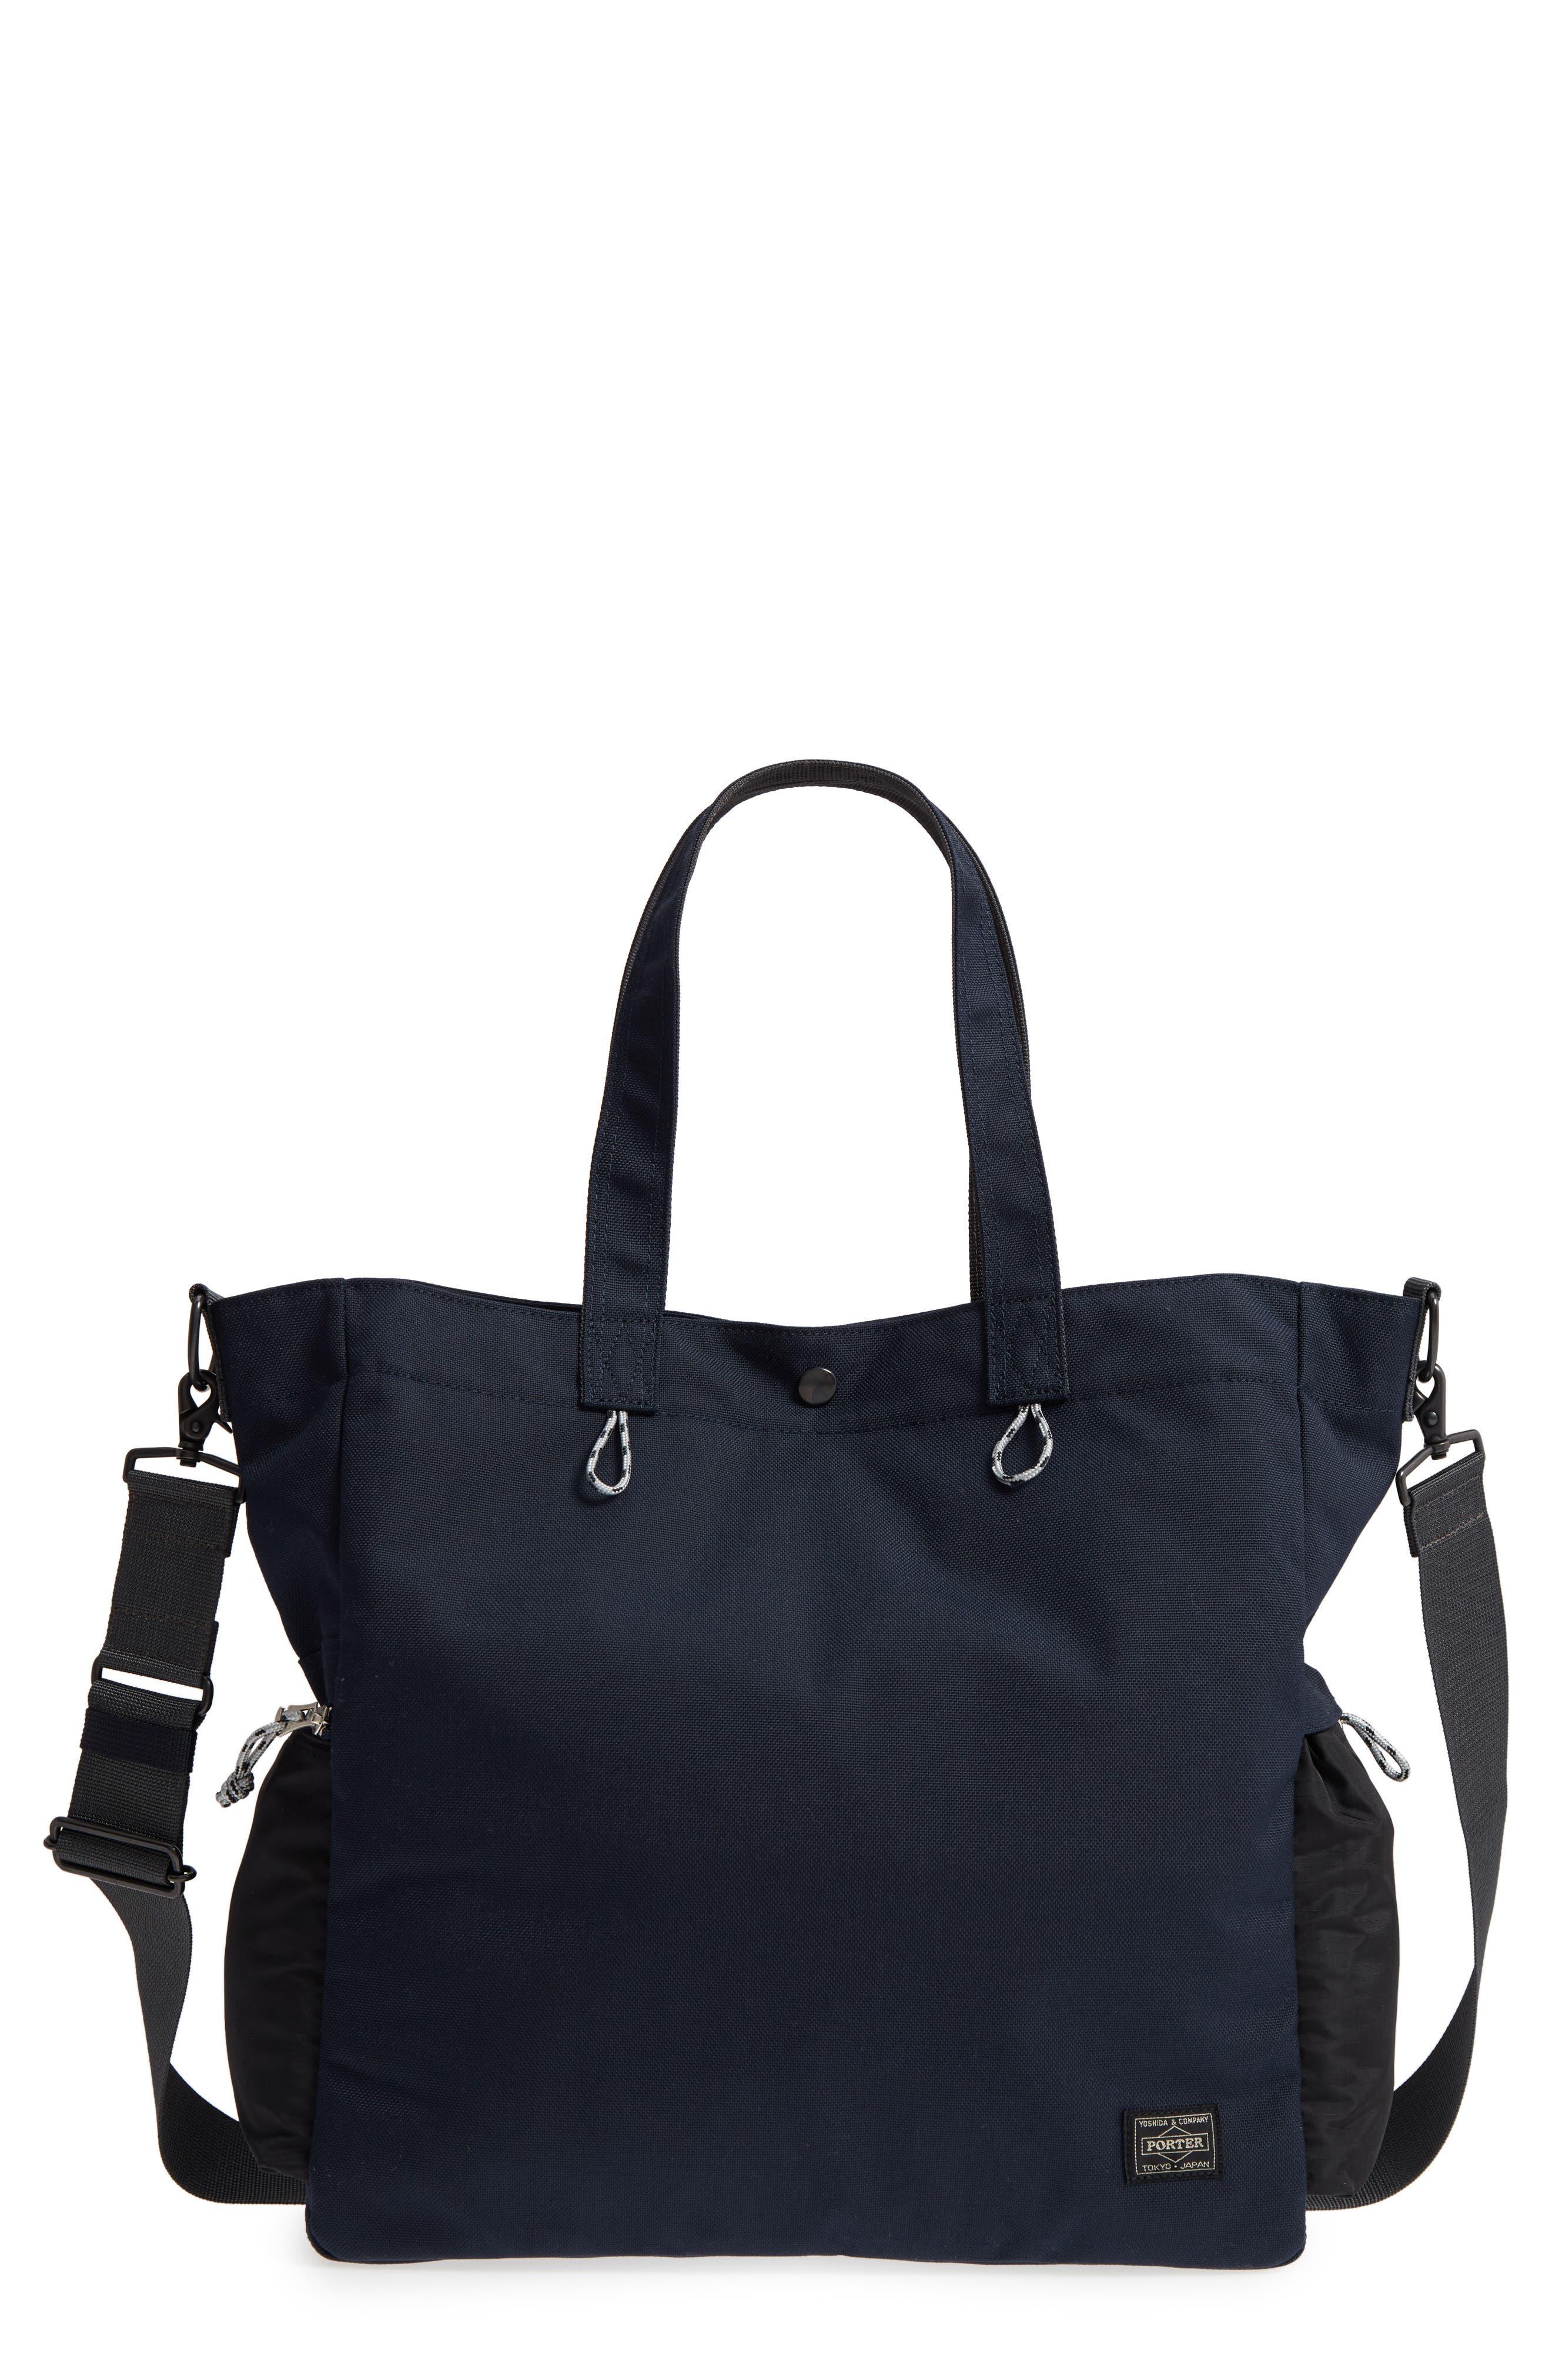 Porter-Yoshida & Co. Hype Tote Bag,                             Main thumbnail 1, color,                             Navy/ Black